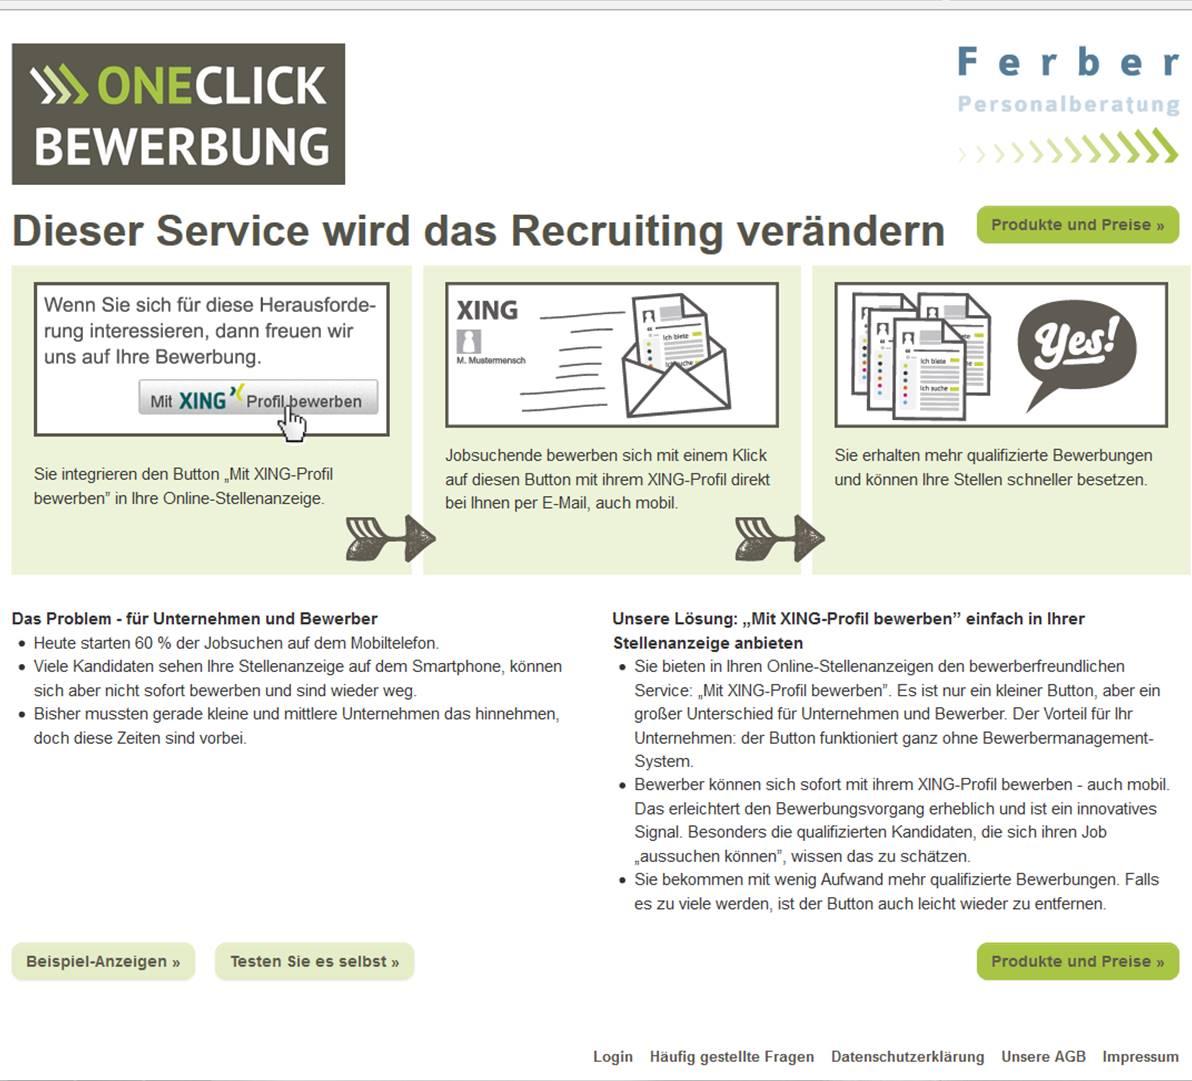 candidate experience praxis one click bewerbung fr kmus - Bewerbung Heute